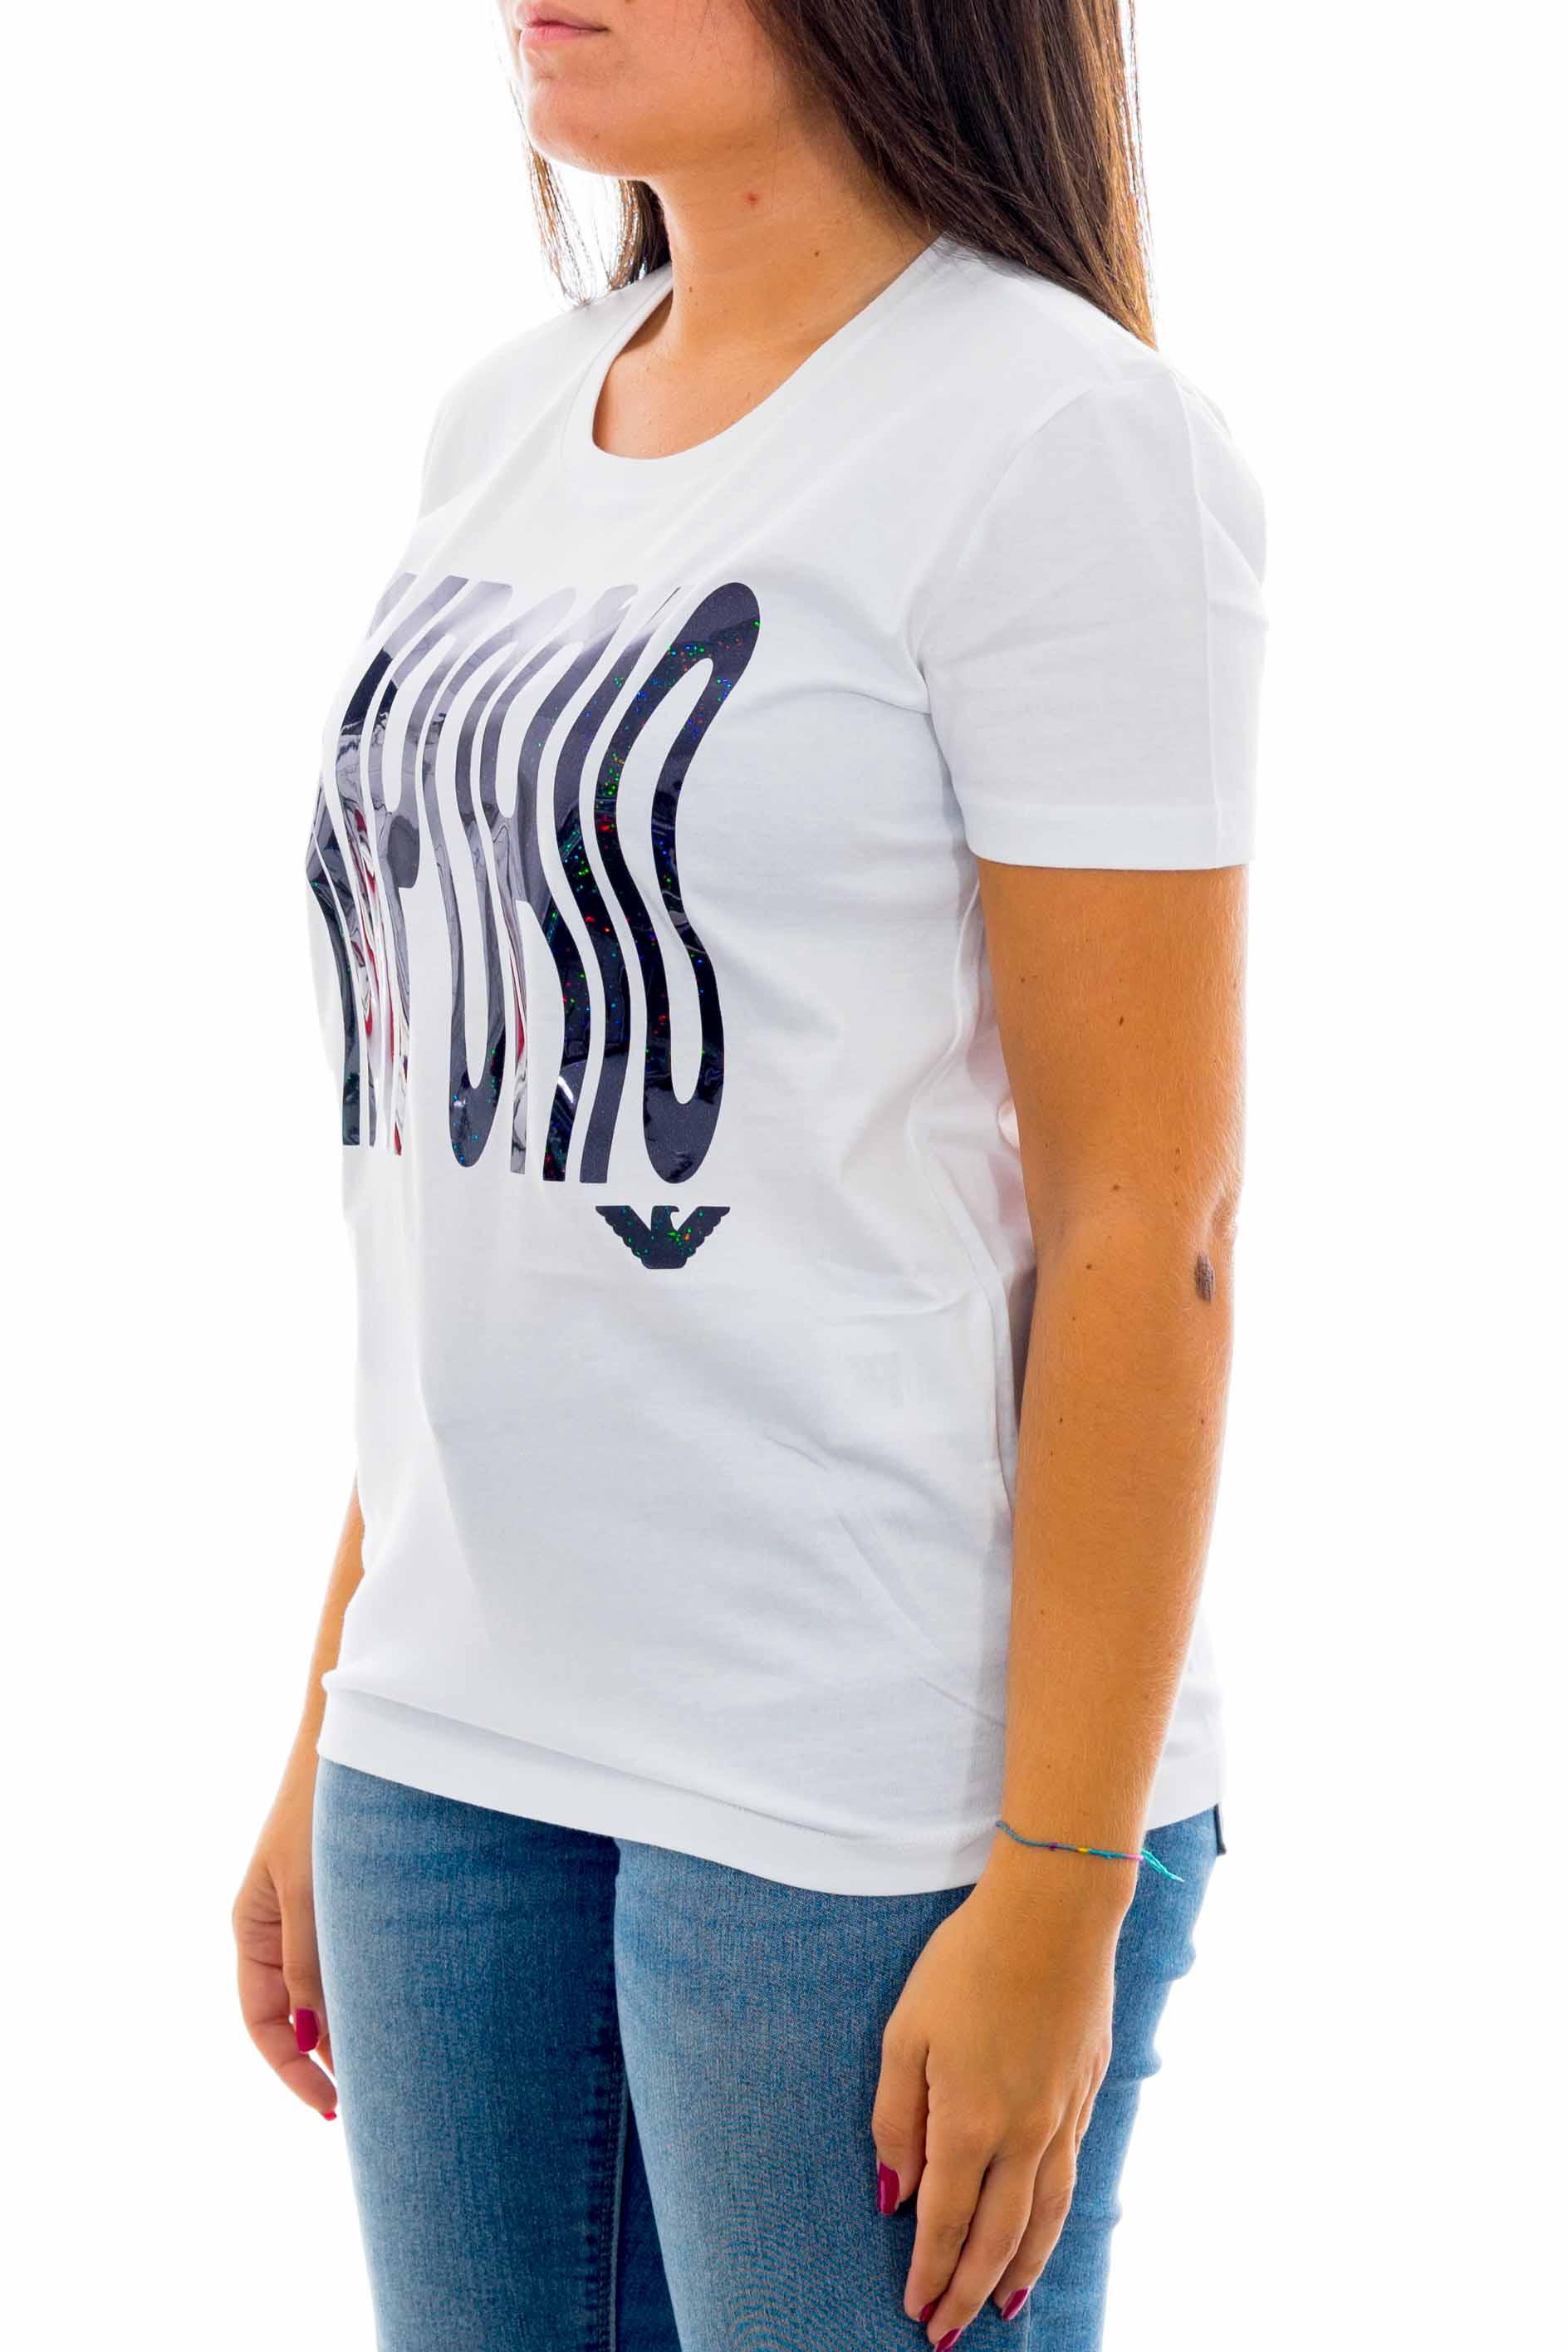 T-shirt EMPORIO ARMANI | T-shirt | 6H2T7E-2J53Z0100